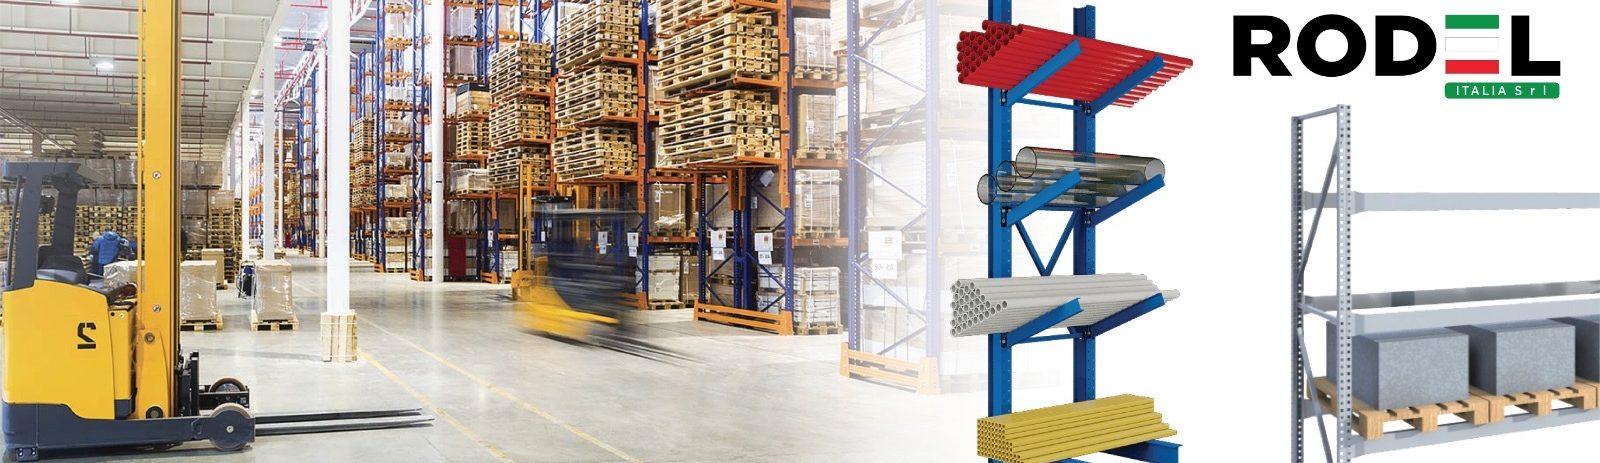 Scaffalature usate e nuove | Scaffalature metalliche industriali | scaffali-industriali-usati/  CENTRO SCAFFALI BOLOGNA compravendita scaffali scaffalature attrezzature industriali, nuovo magazzino AUSTRIA